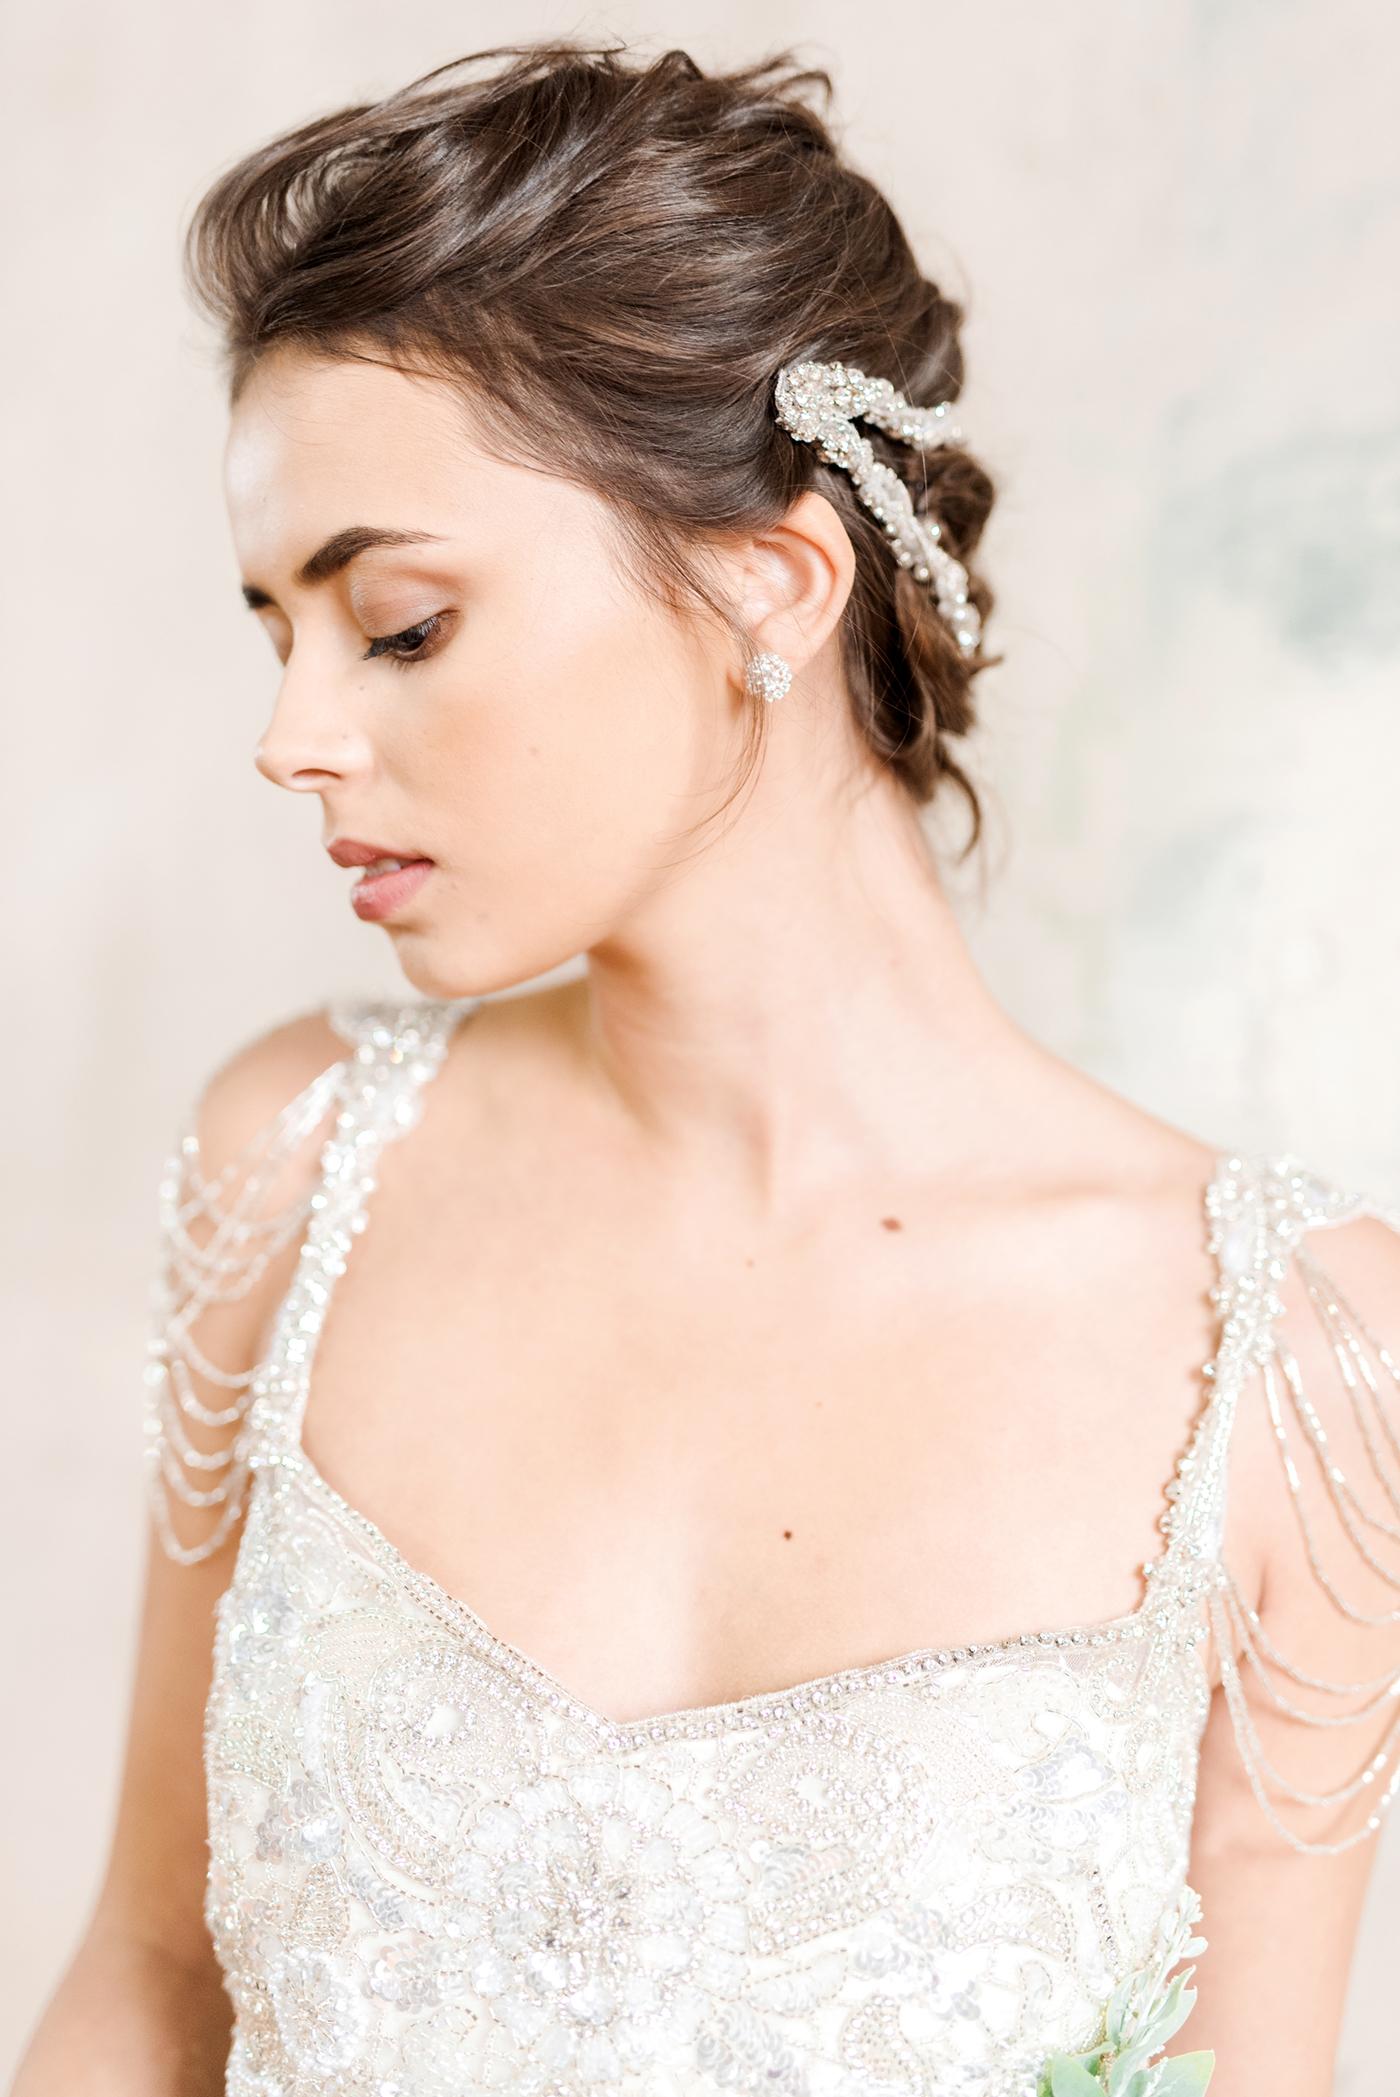 Anna Campbell Bridal   Chloe Dress   Vintage Inspired Beaded Wedding Dress   Eternal Heart Collection